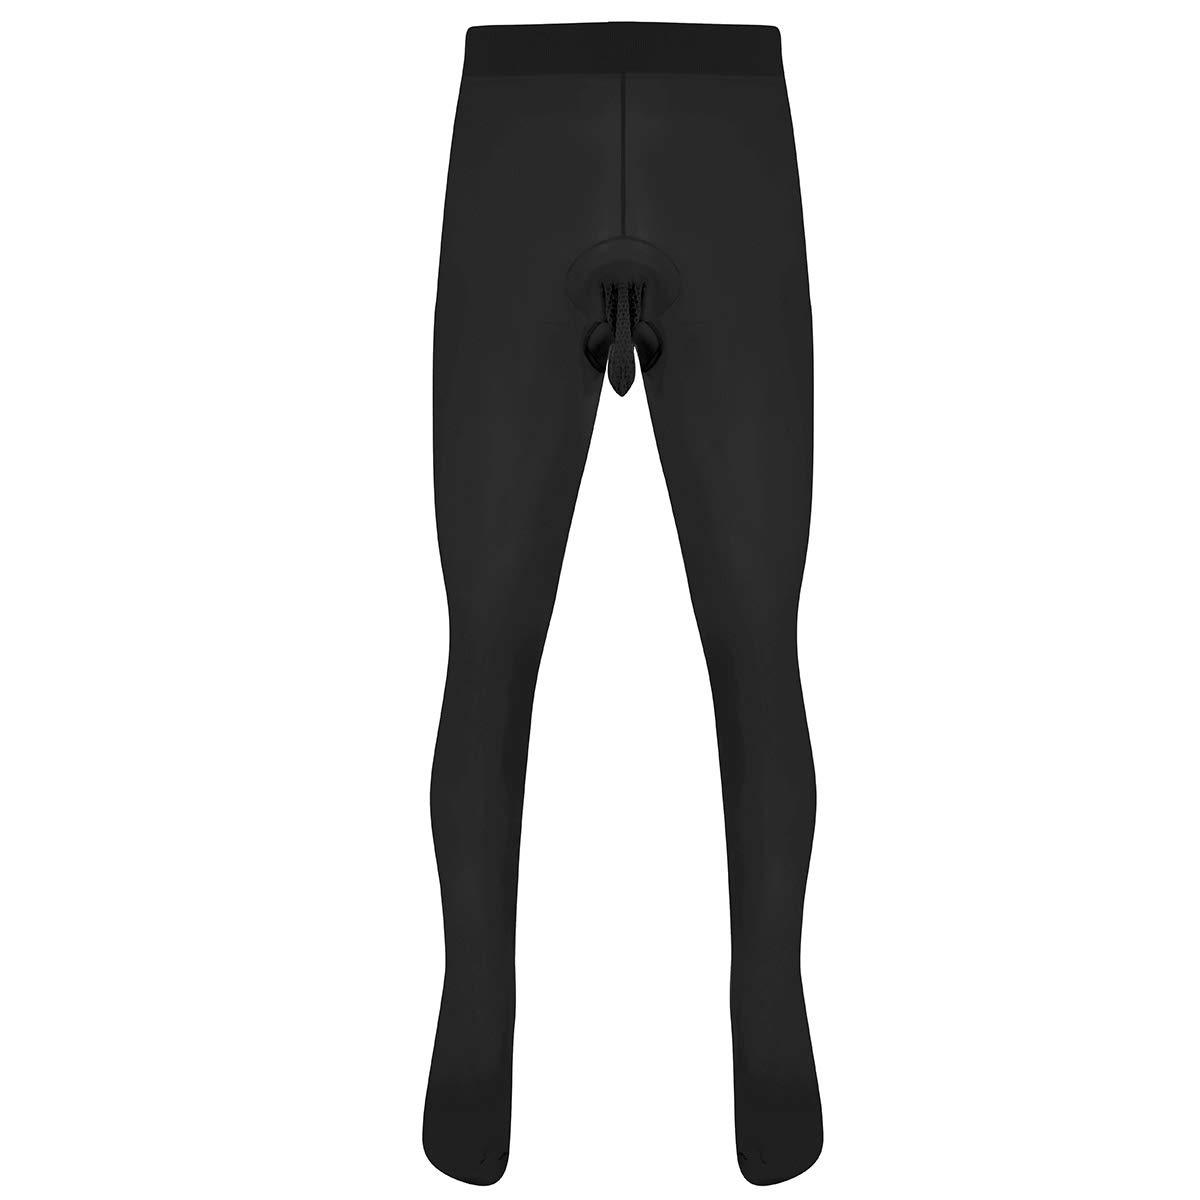 Freebily Men's Sexy Seamless Skinny Stretchy Leggings Tights Underwear Pantyhose Hosiery Stockings CH10066452-10066450-UK